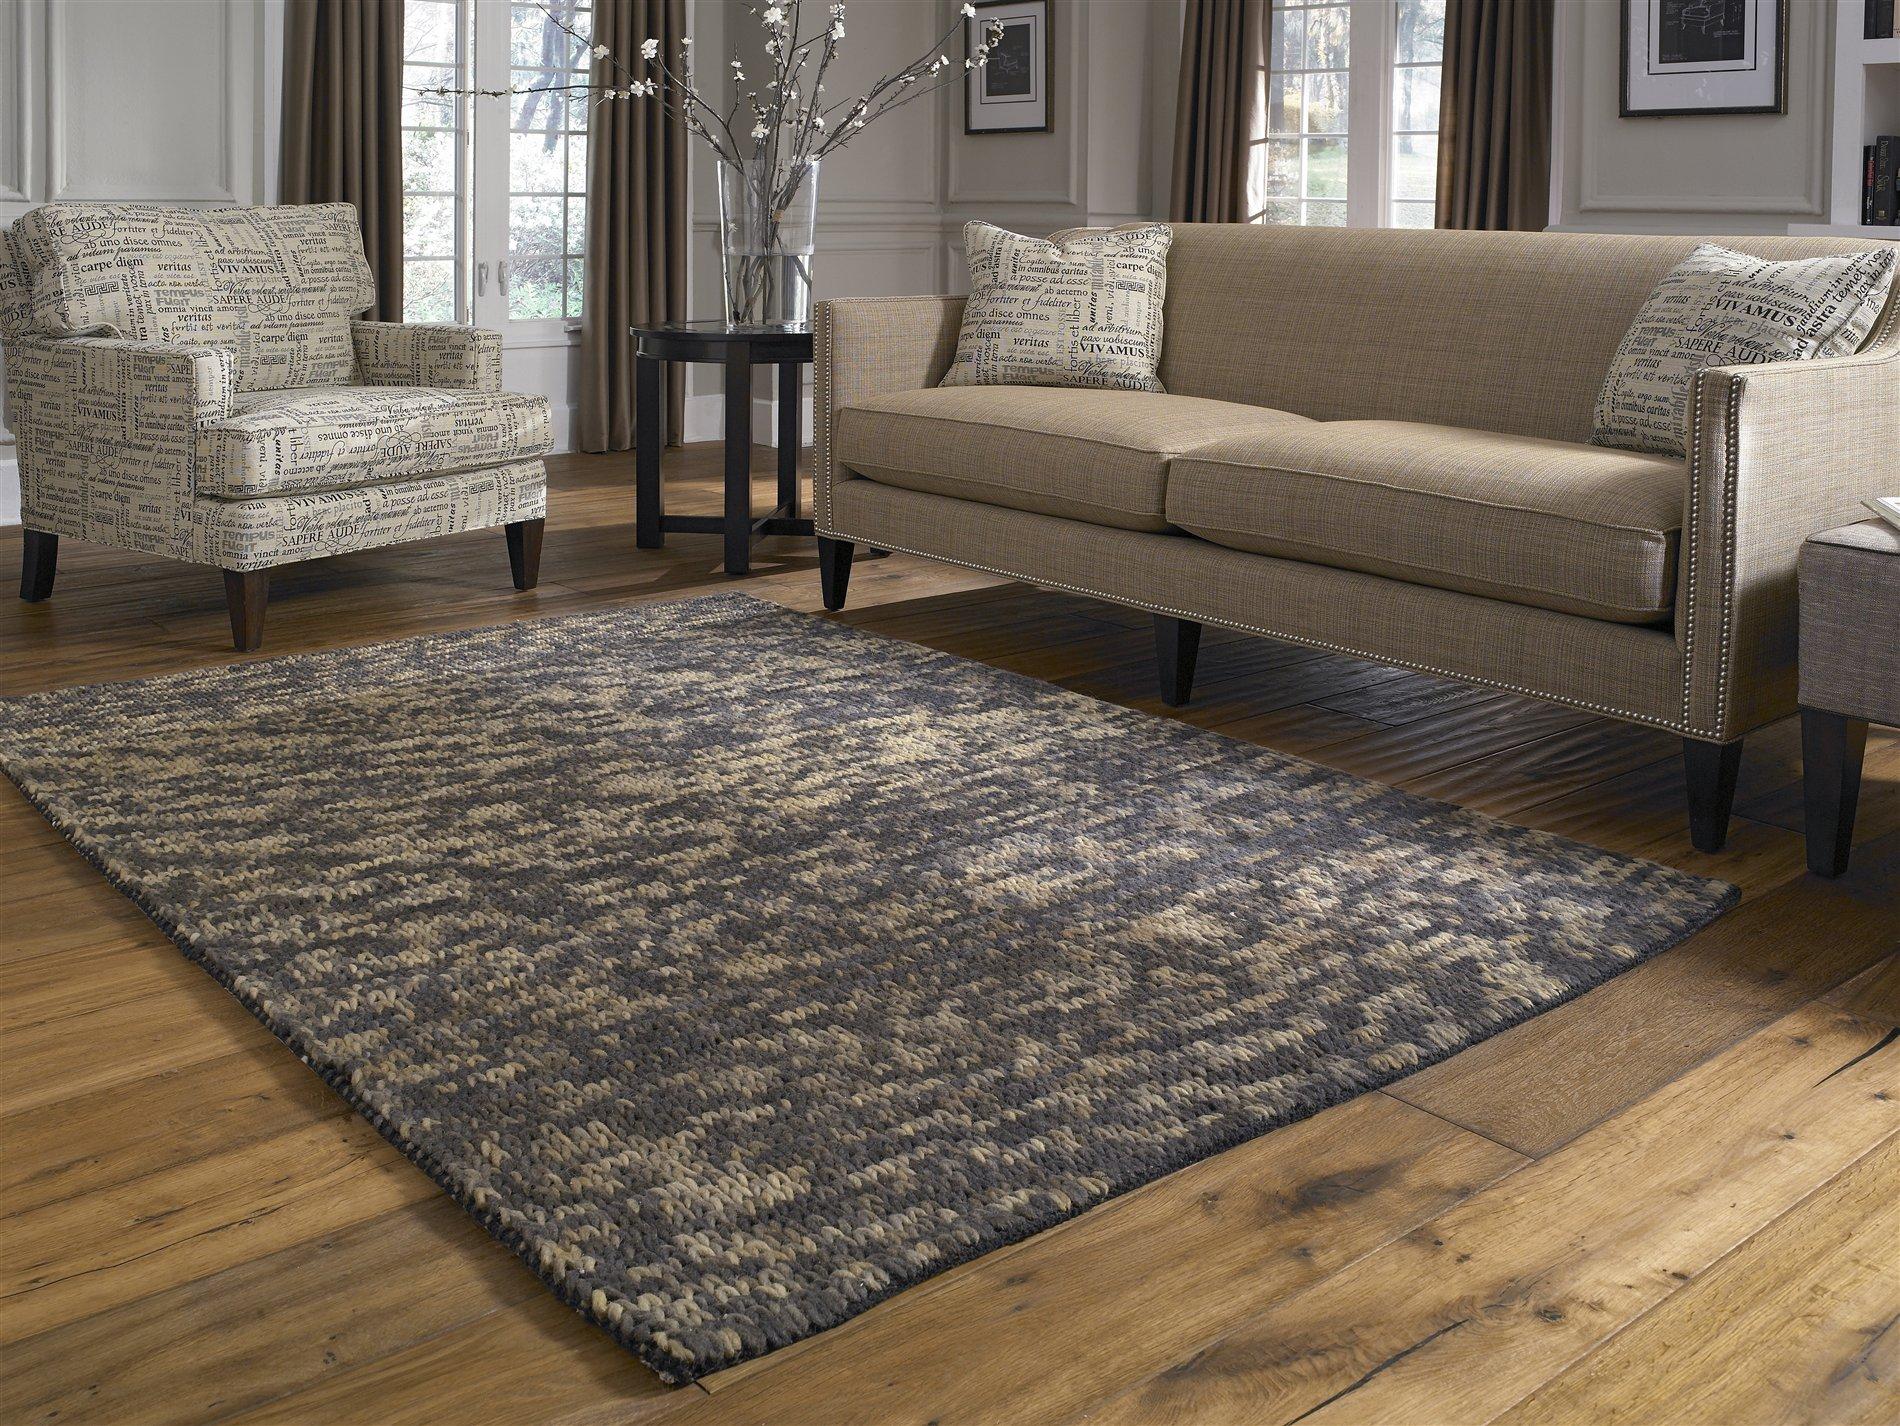 moss studio sofa reviews cane set online bangalore loloi rugs renorn 01my renoir gray modern